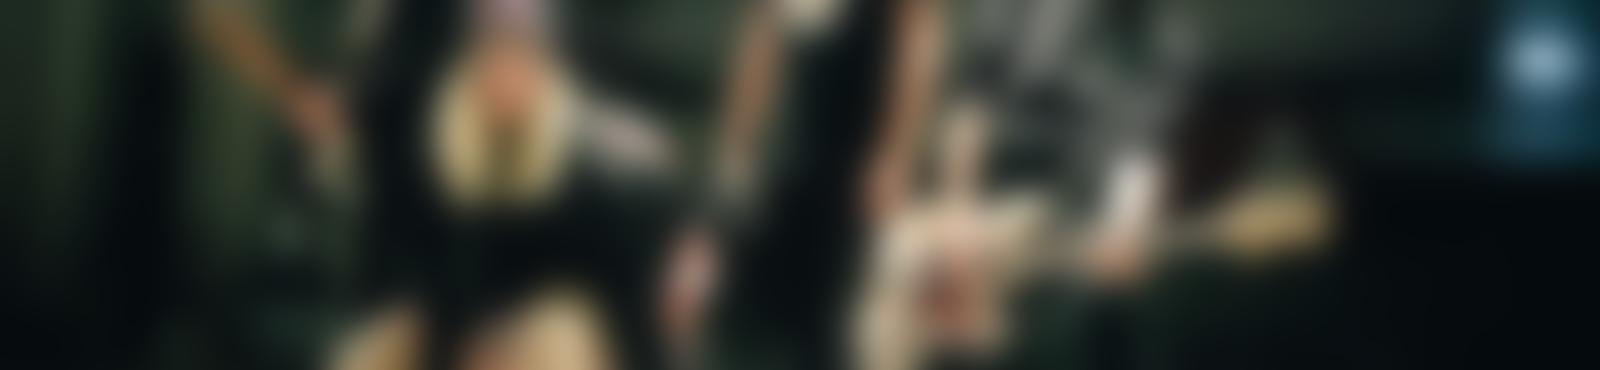 Blurred 1c894eaa a3f5 454d b2e6 5052ccca55aa